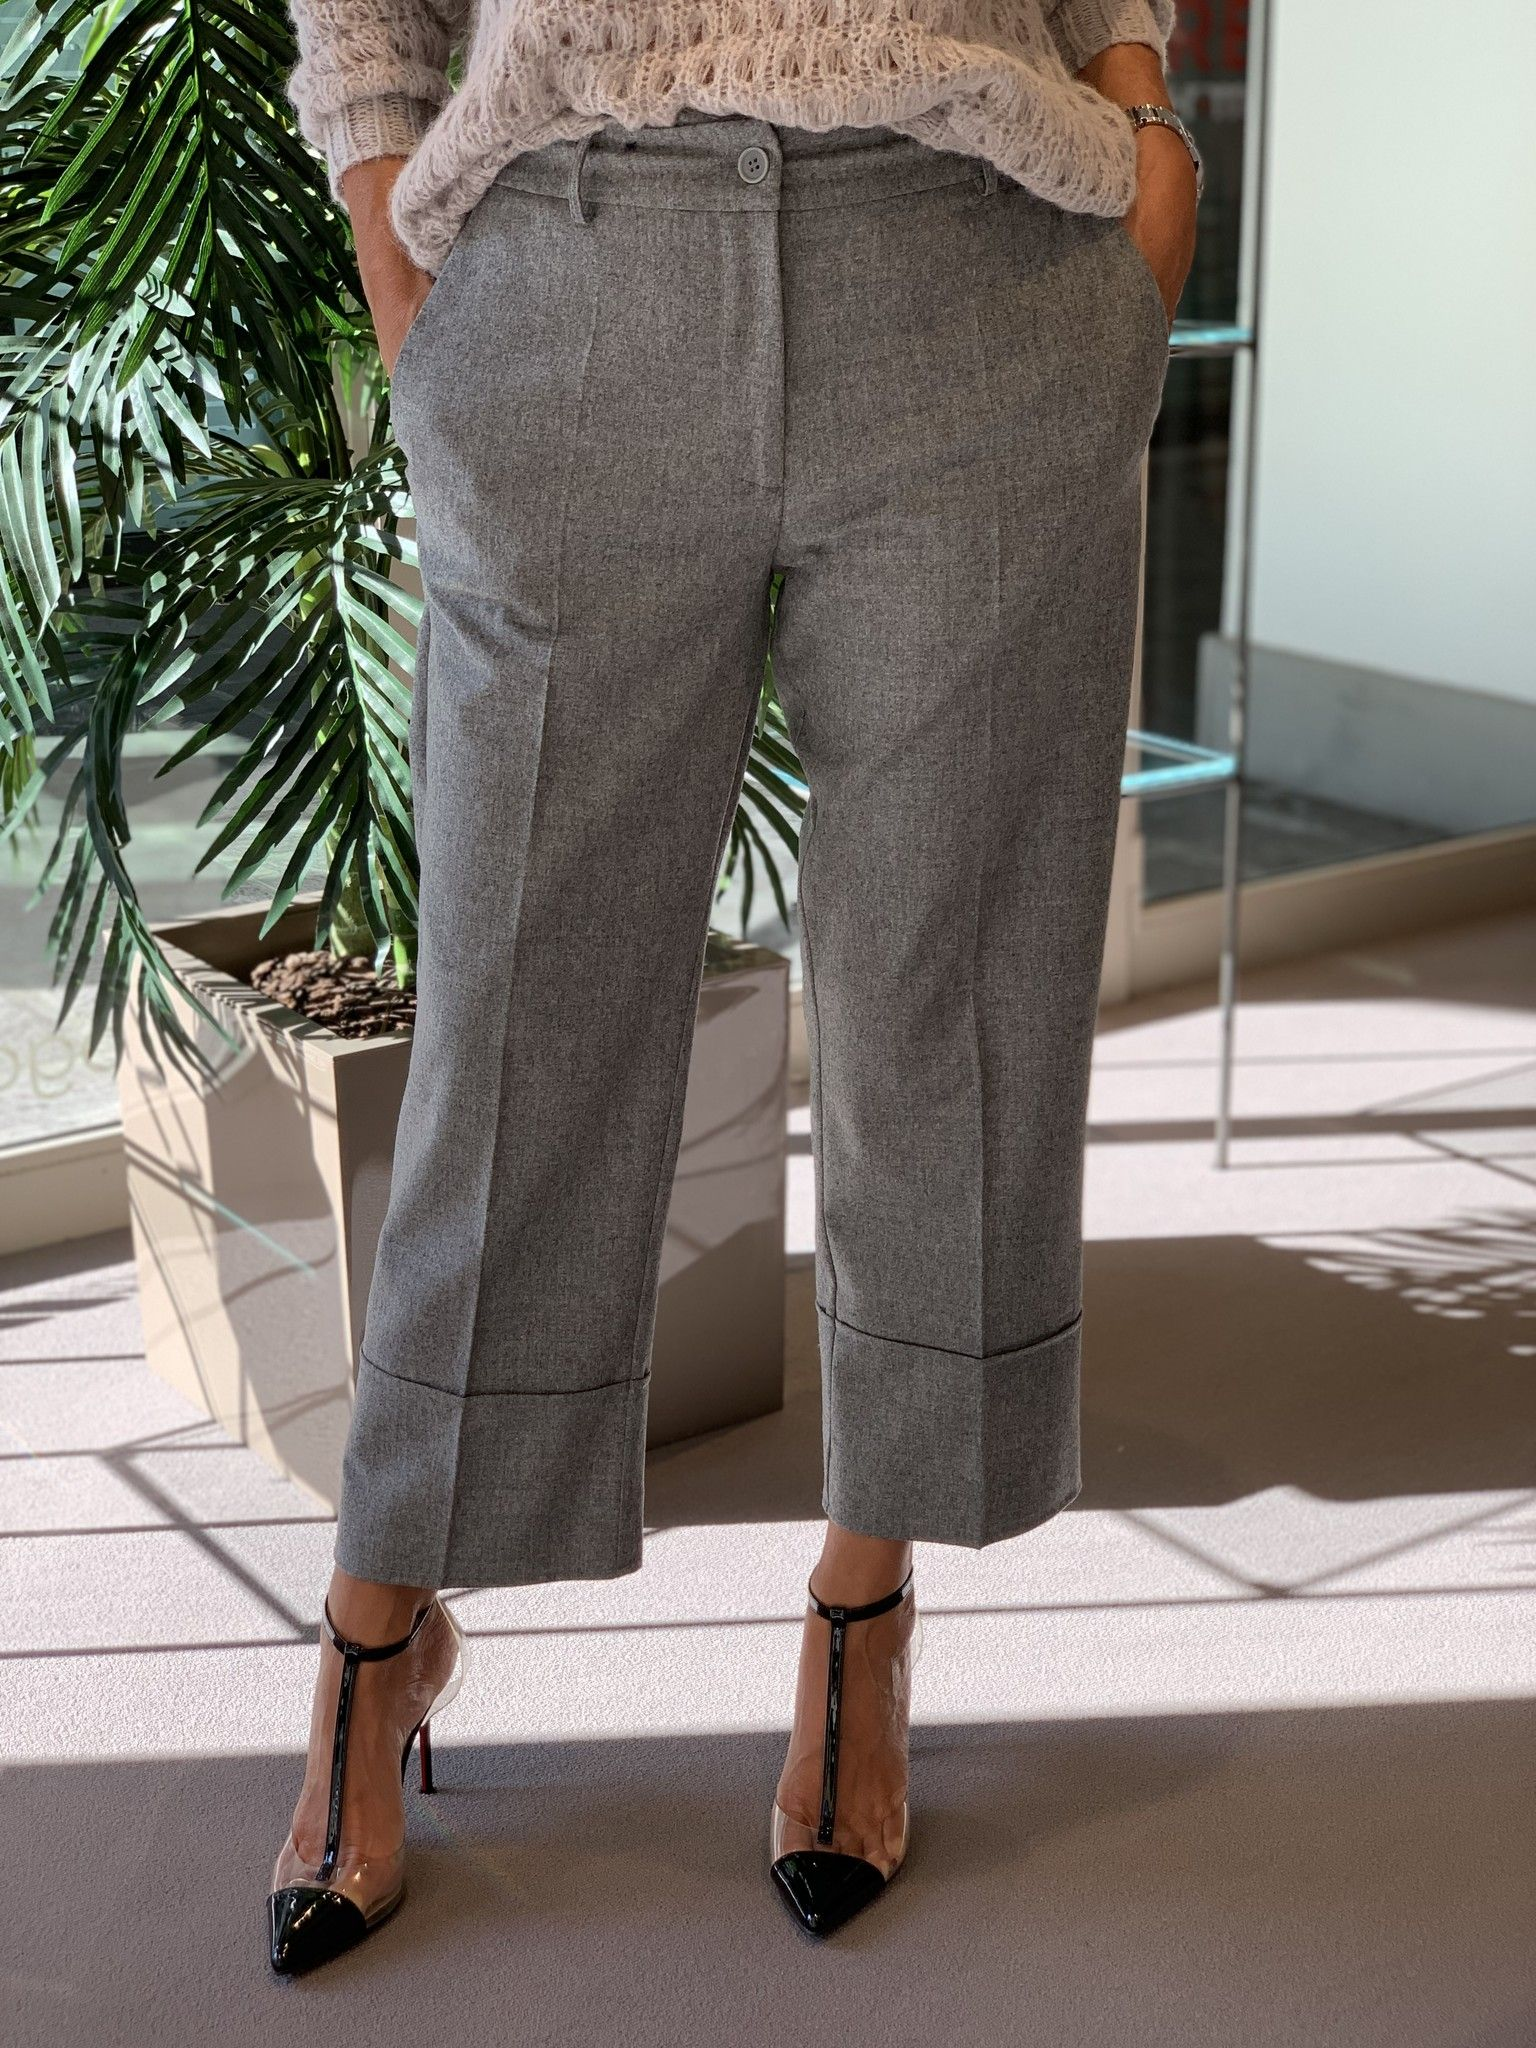 Pantalone Emilia NG71 grigio